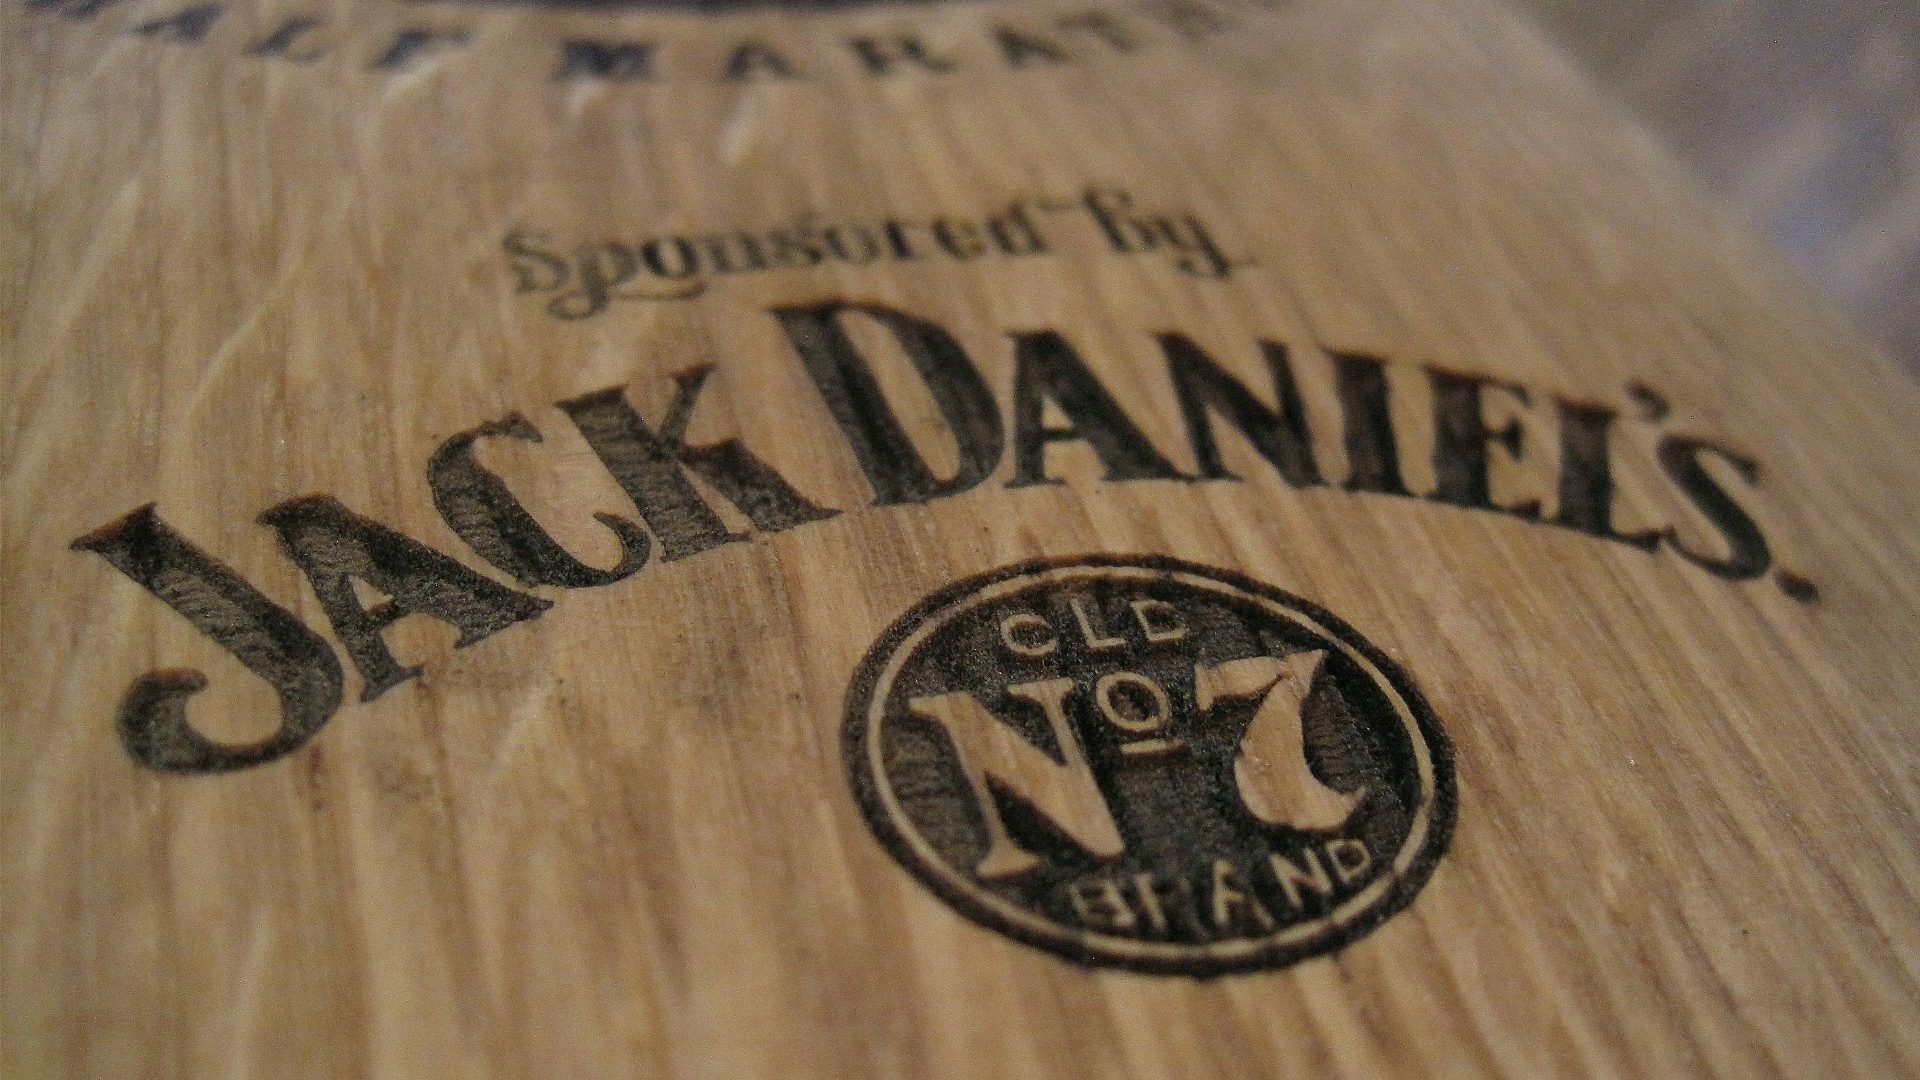 hd hintergrundbilder jack daniels logo schriftzug buchstaben 1920x1080